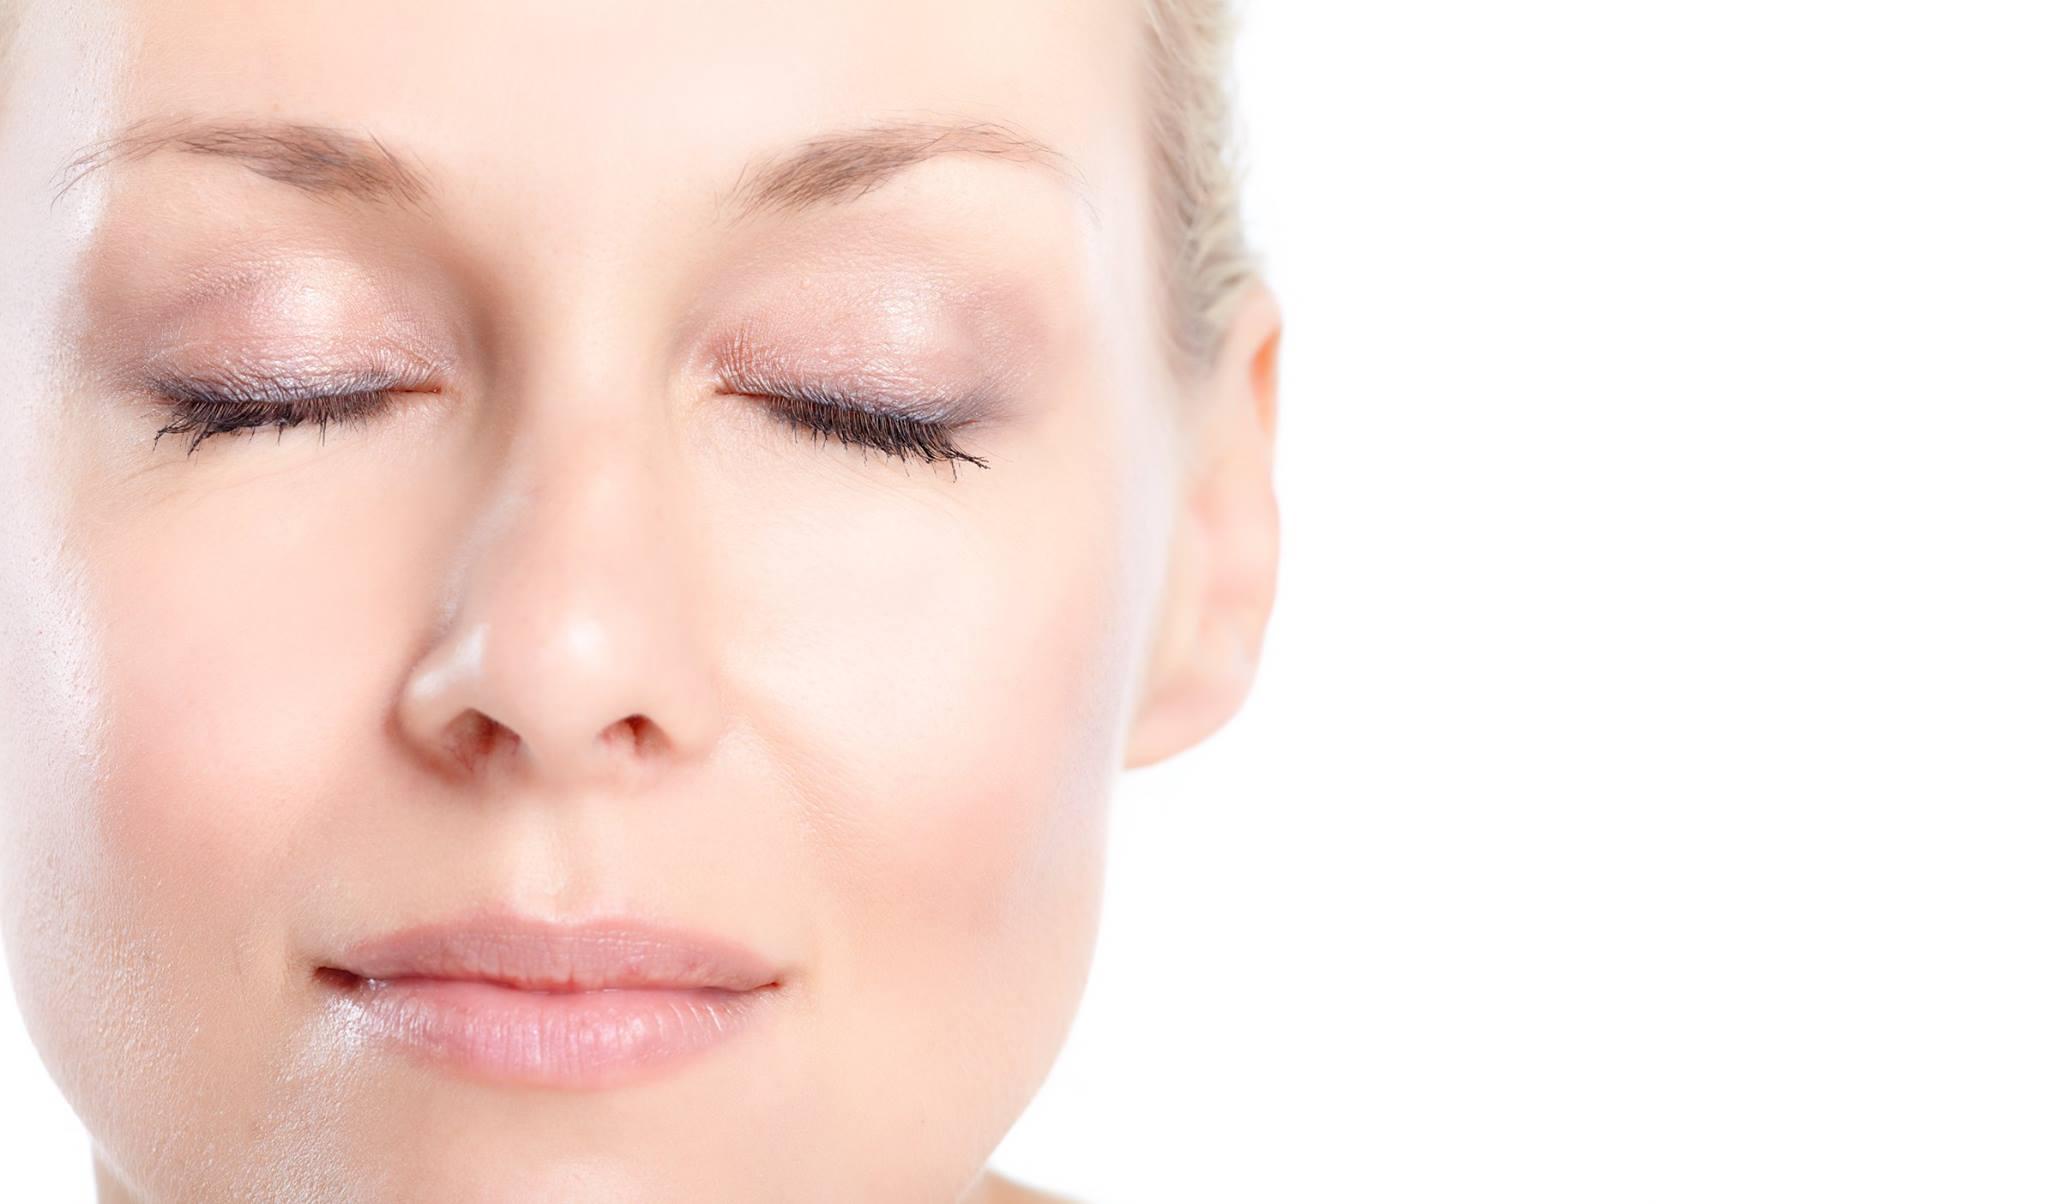 Laser Wrinkle Removal Toronto Igbeauty Laser Clinic Toronto